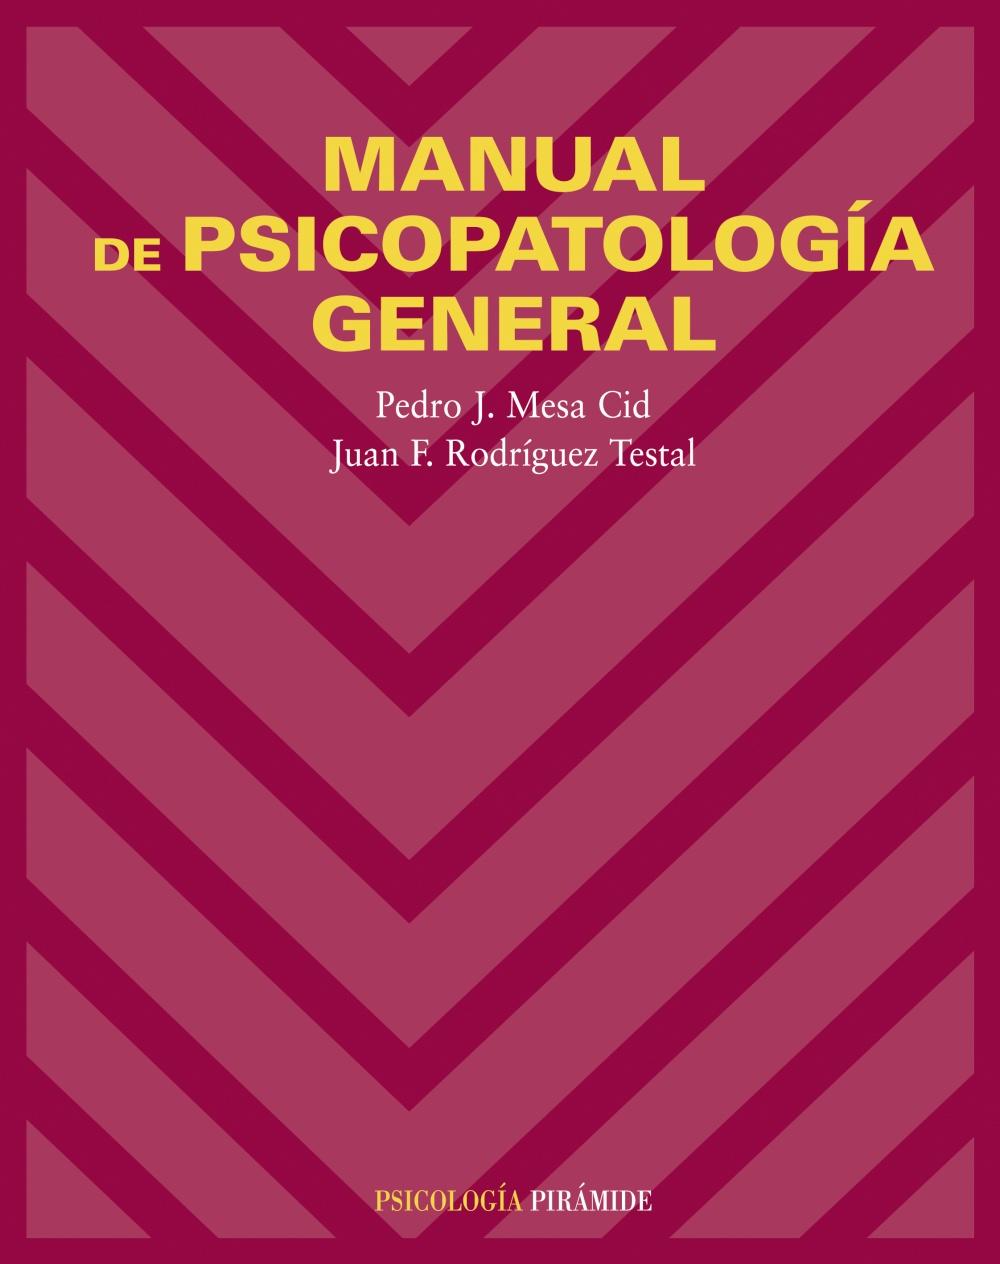 Manual De Psicopatologia General - Rodriguez Testal Juan Francisco